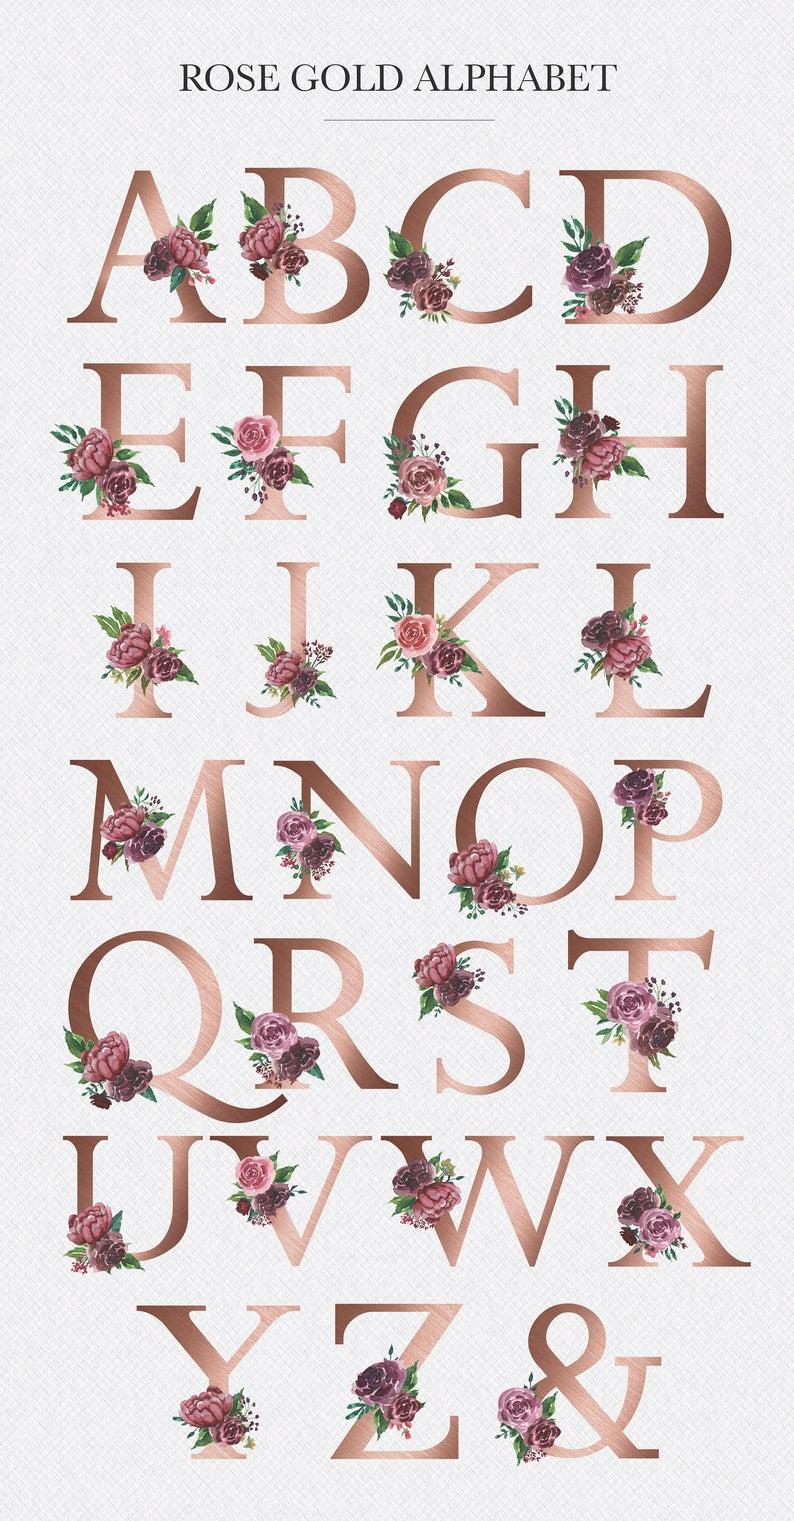 Watercolor Floral Alphabet | Rose Gold Alphabet | Monogram Letters | Forest Clipart| embellished floral alphabet | Decor Art Flowers - #alphabet #art #clipart #Decor #embellished #Floral #flowers #forest #gold #Letters #monogram #rose #Watercolor